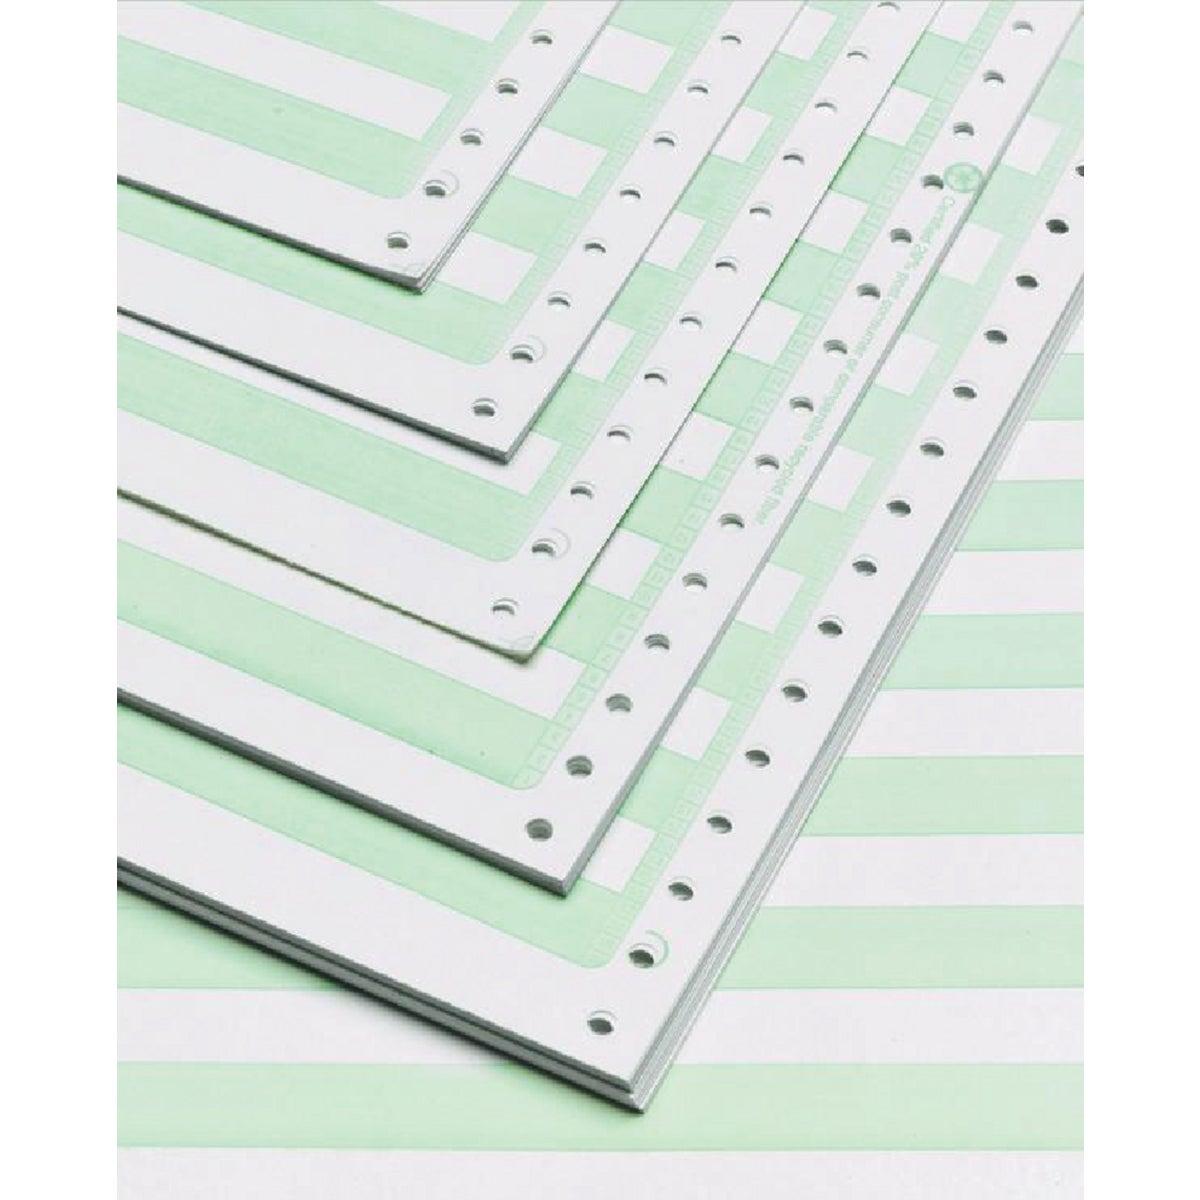 Greenbar Computer Printer Paper